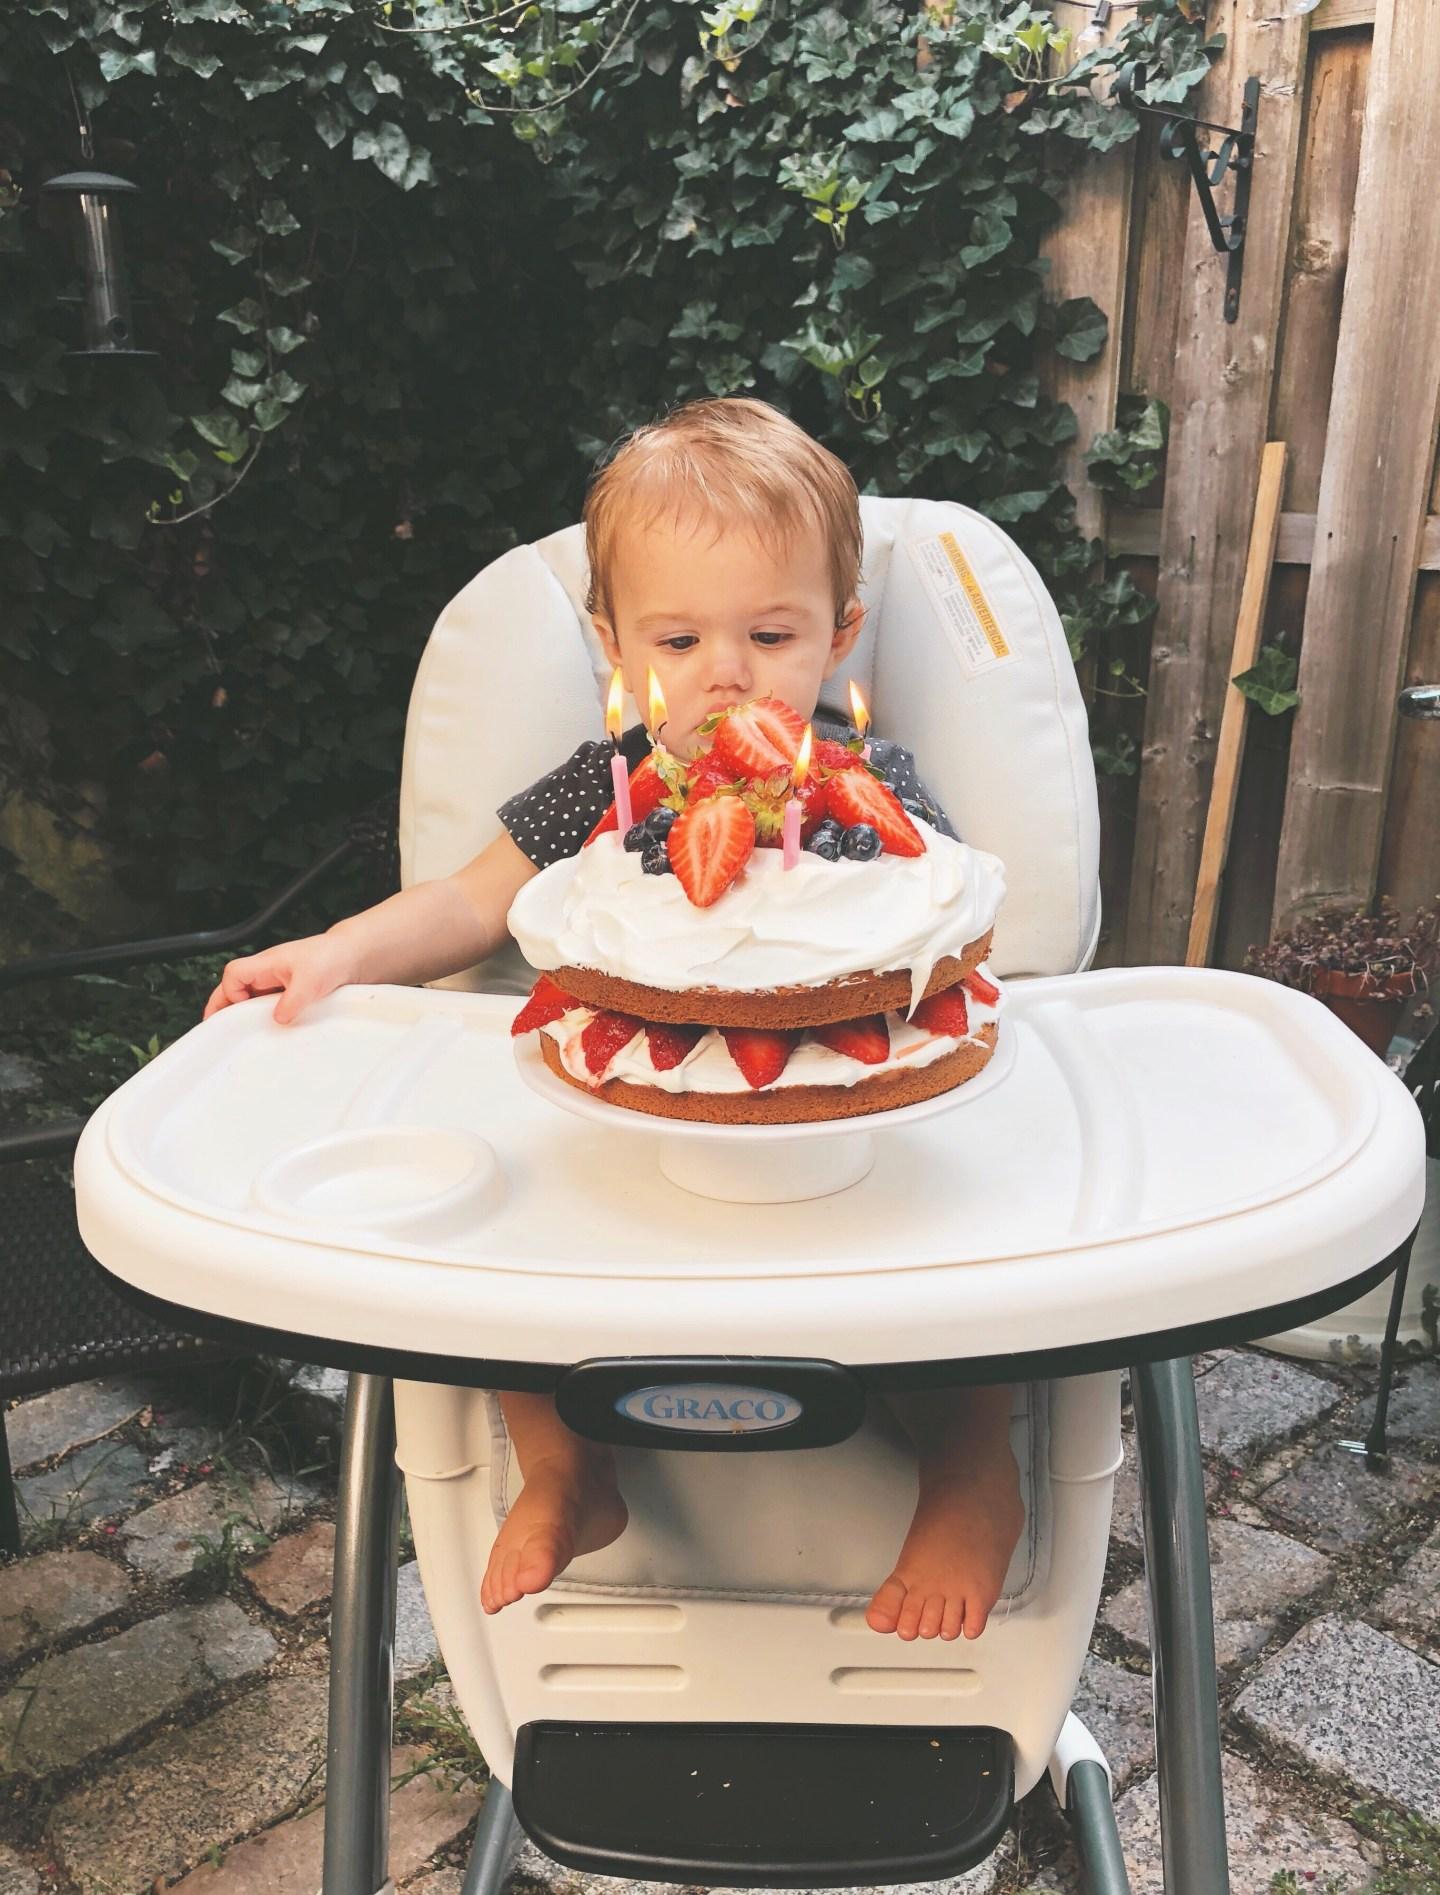 Lifestyle Blogger Chocolate & Lace shares her recipe for Strawberry Celebration Pound Cake.